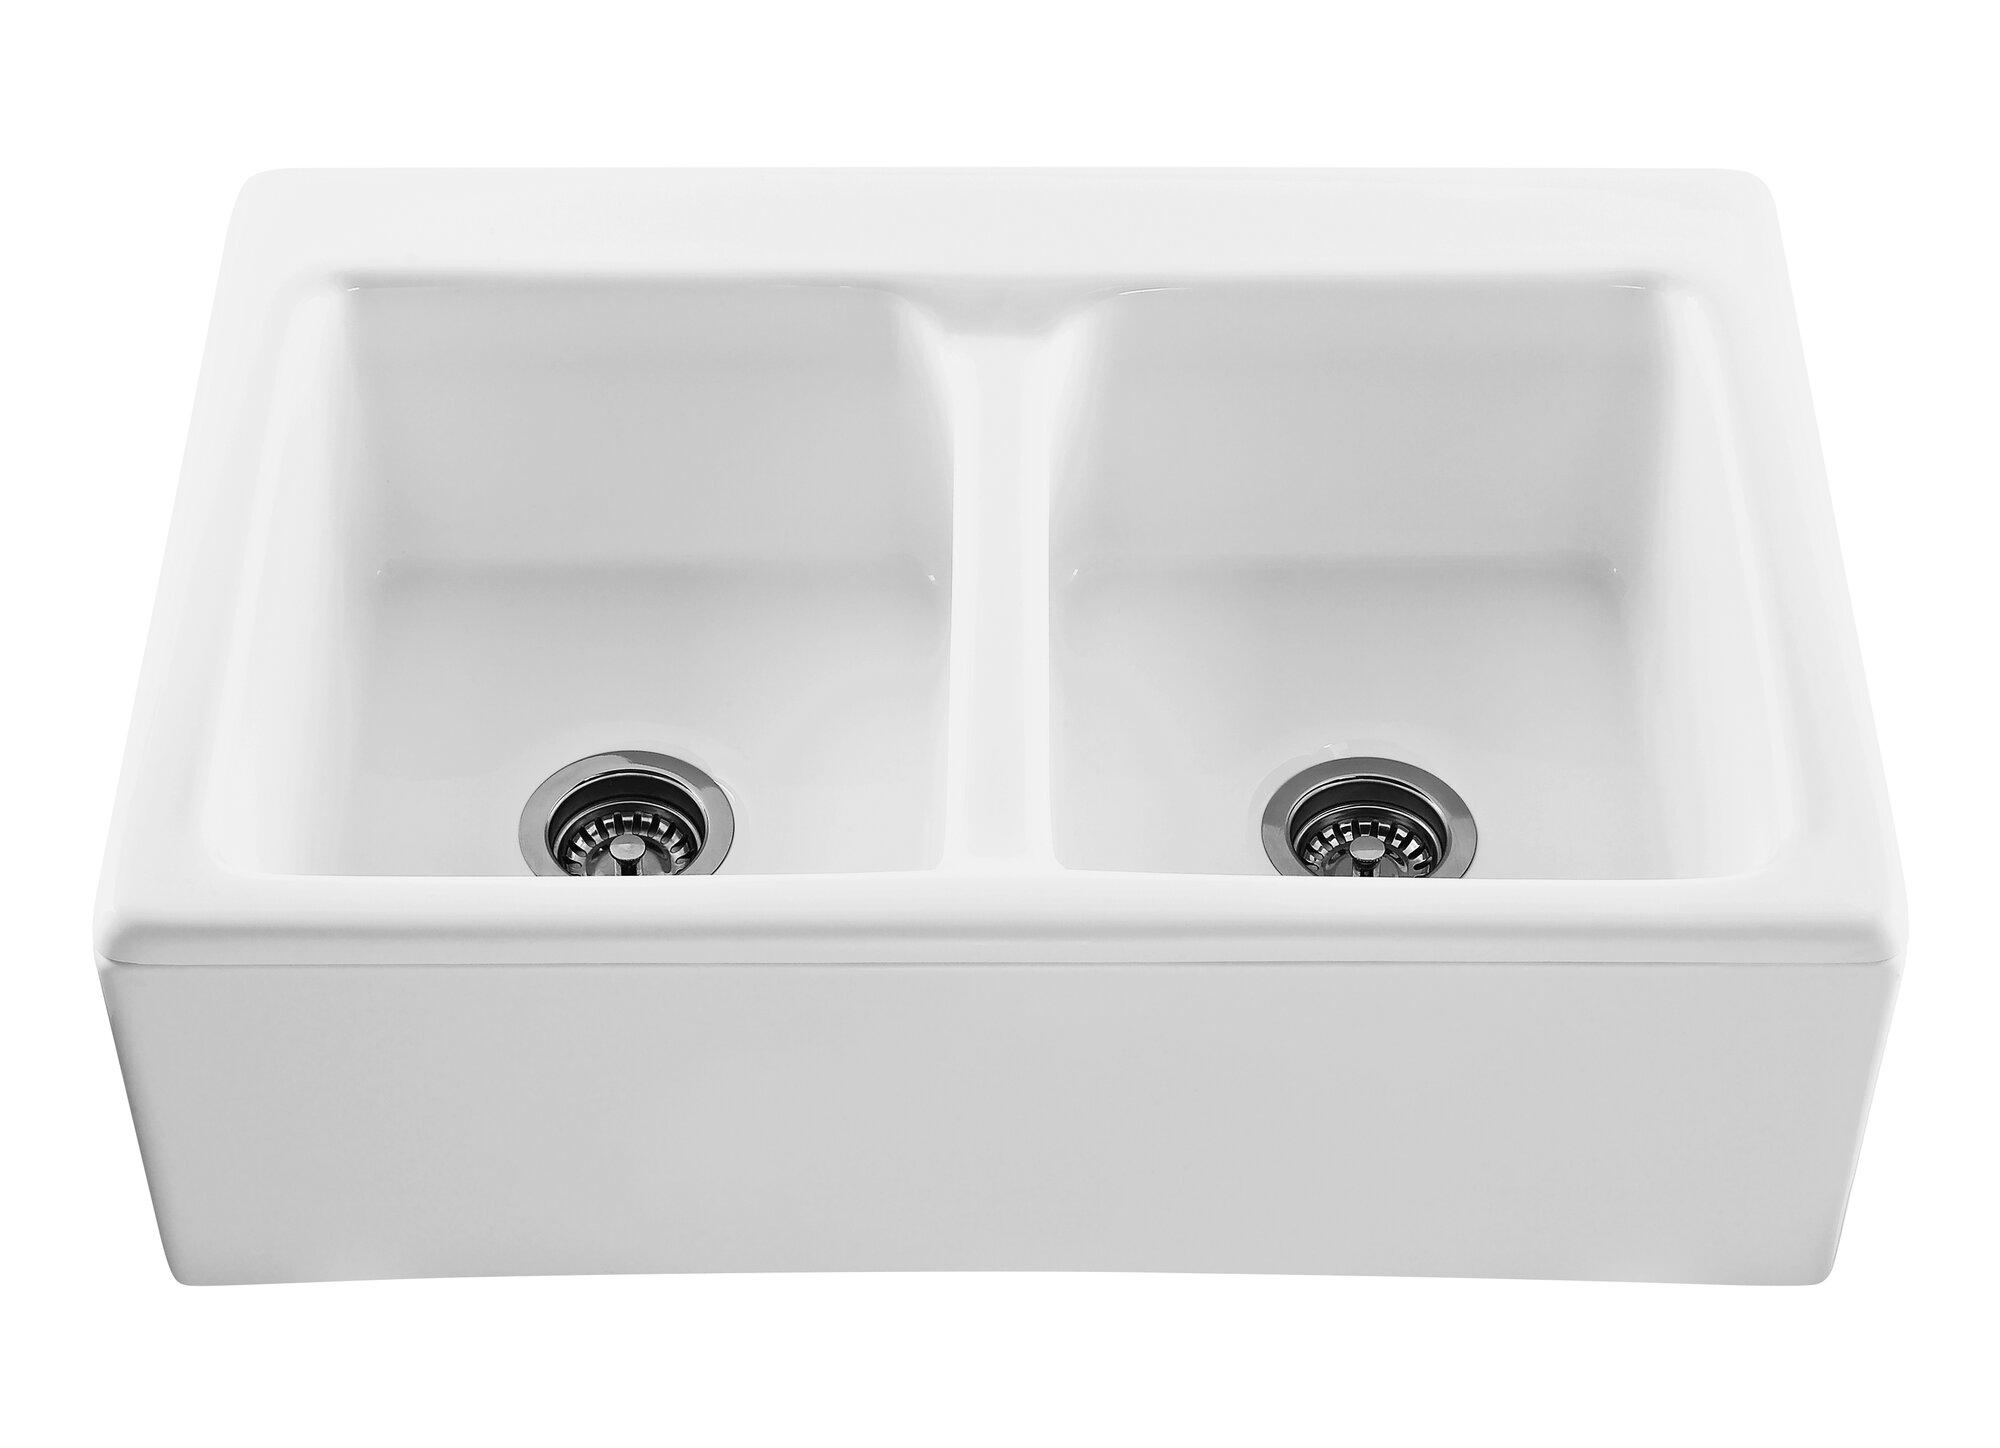 Double Bowl Kitchen Sinks Reliance lyle 3325 x 2225 appalachian double bowl kitchen sink reliance lyle 33 25 034 x 22 25 workwithnaturefo